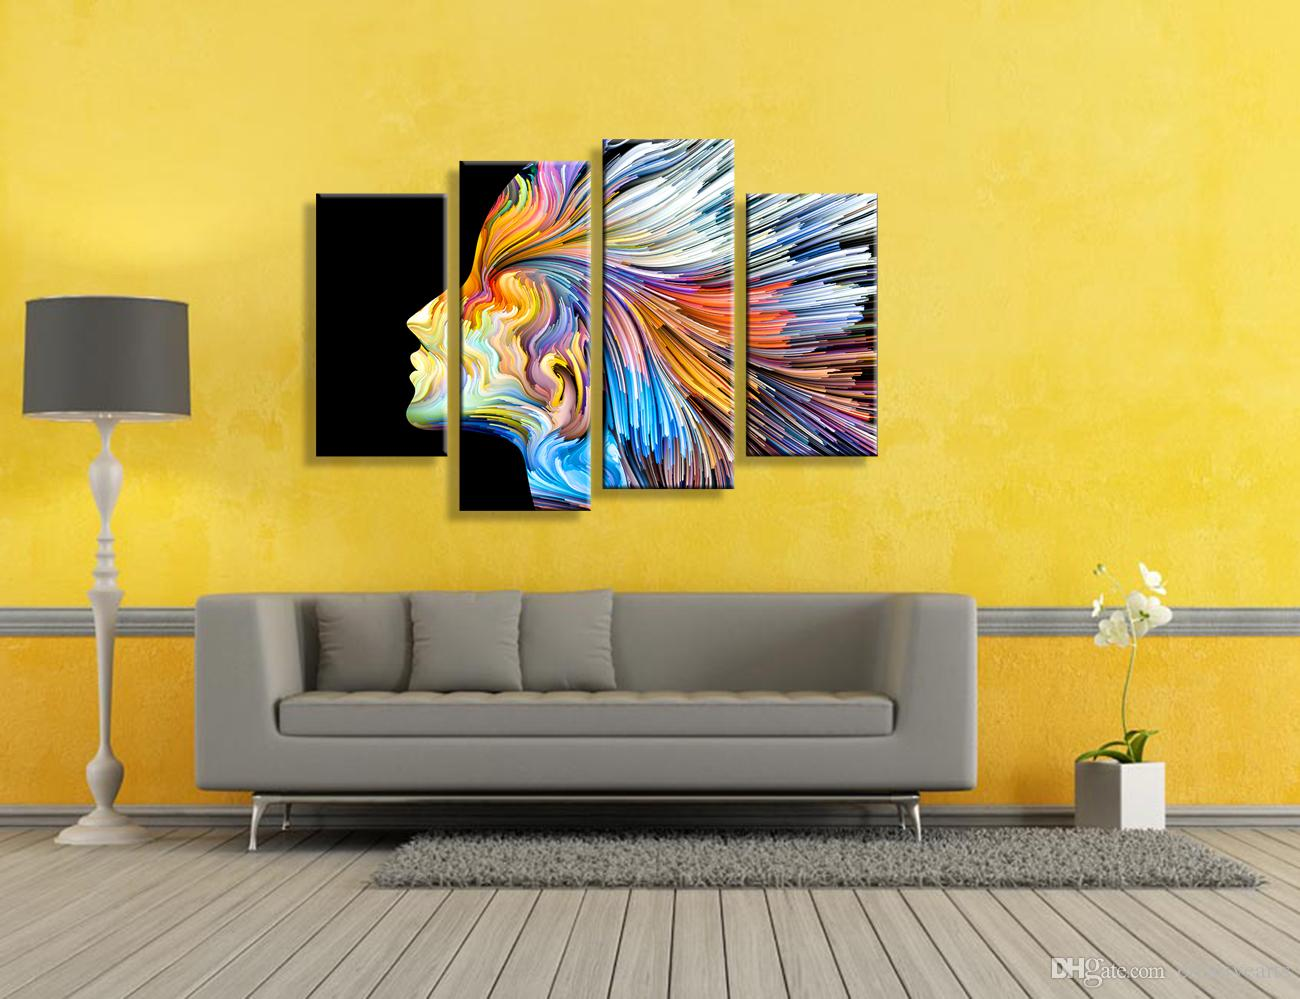 Abstract Painting Girl Photo Prints Giclee Prints for Living Room Office Unframed30cmx60cmx2 30cmx80cmx2